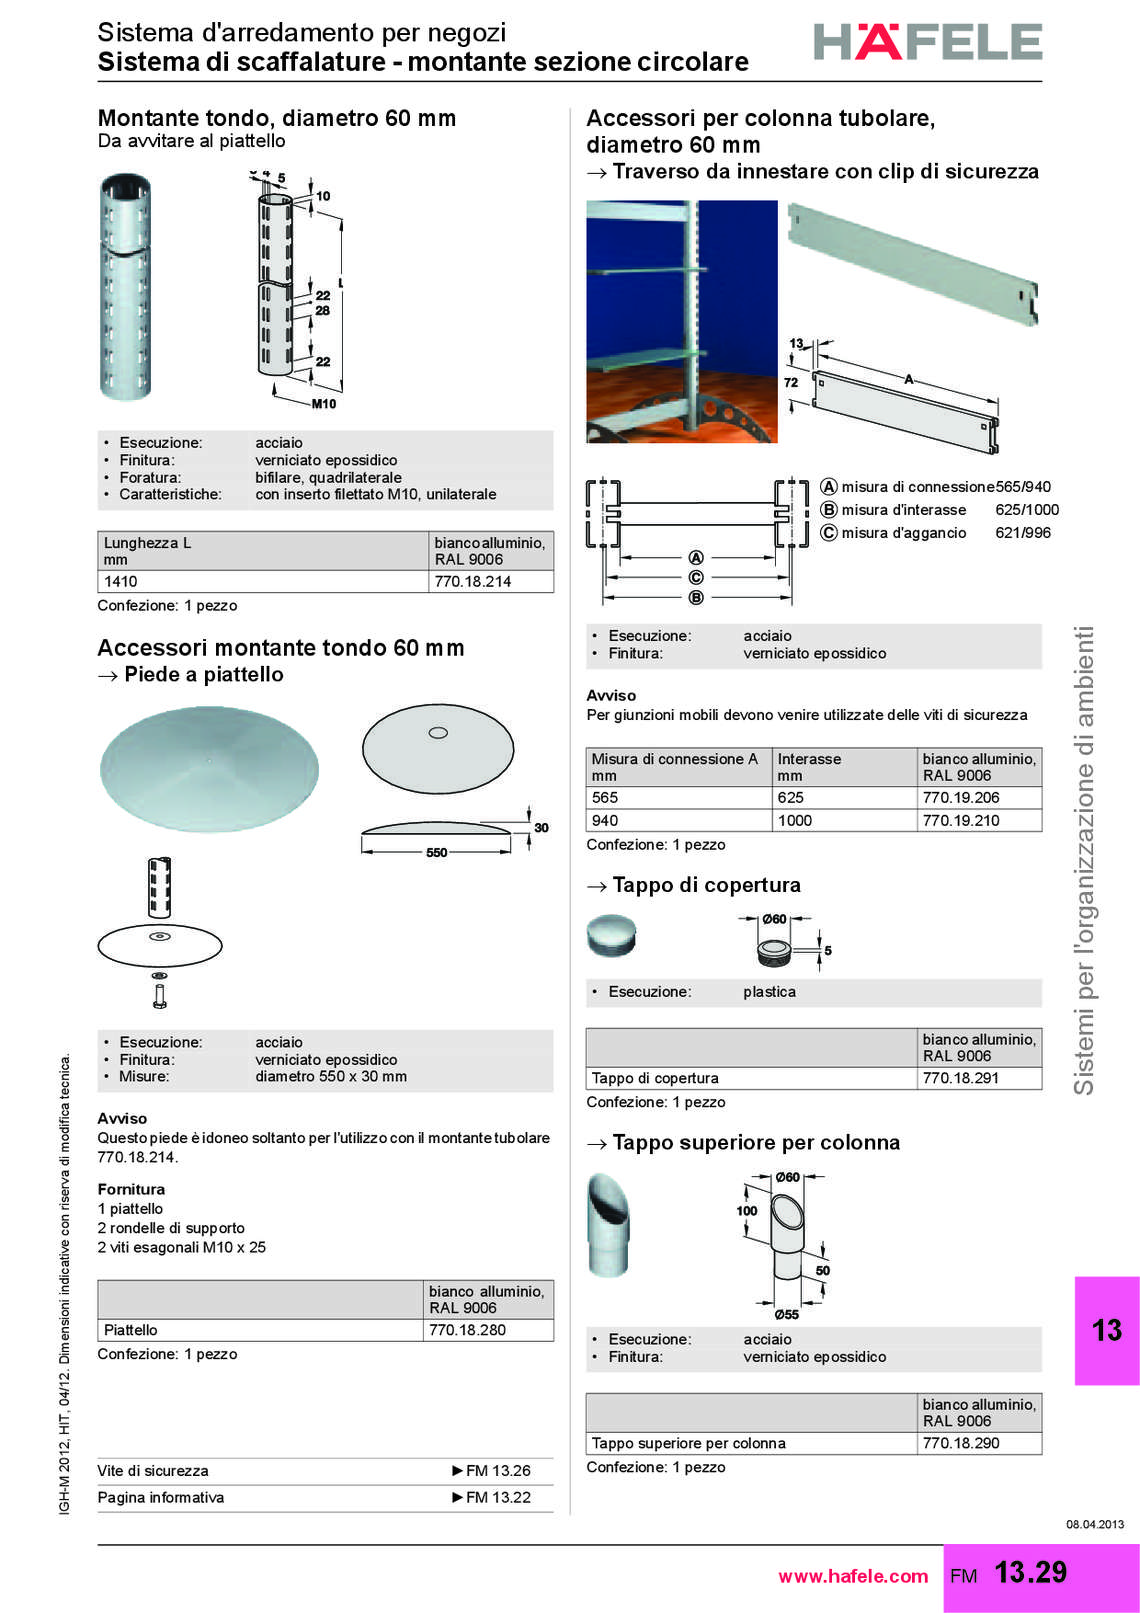 hafele-arredo-negozi-e-farmacie_32_040.jpg